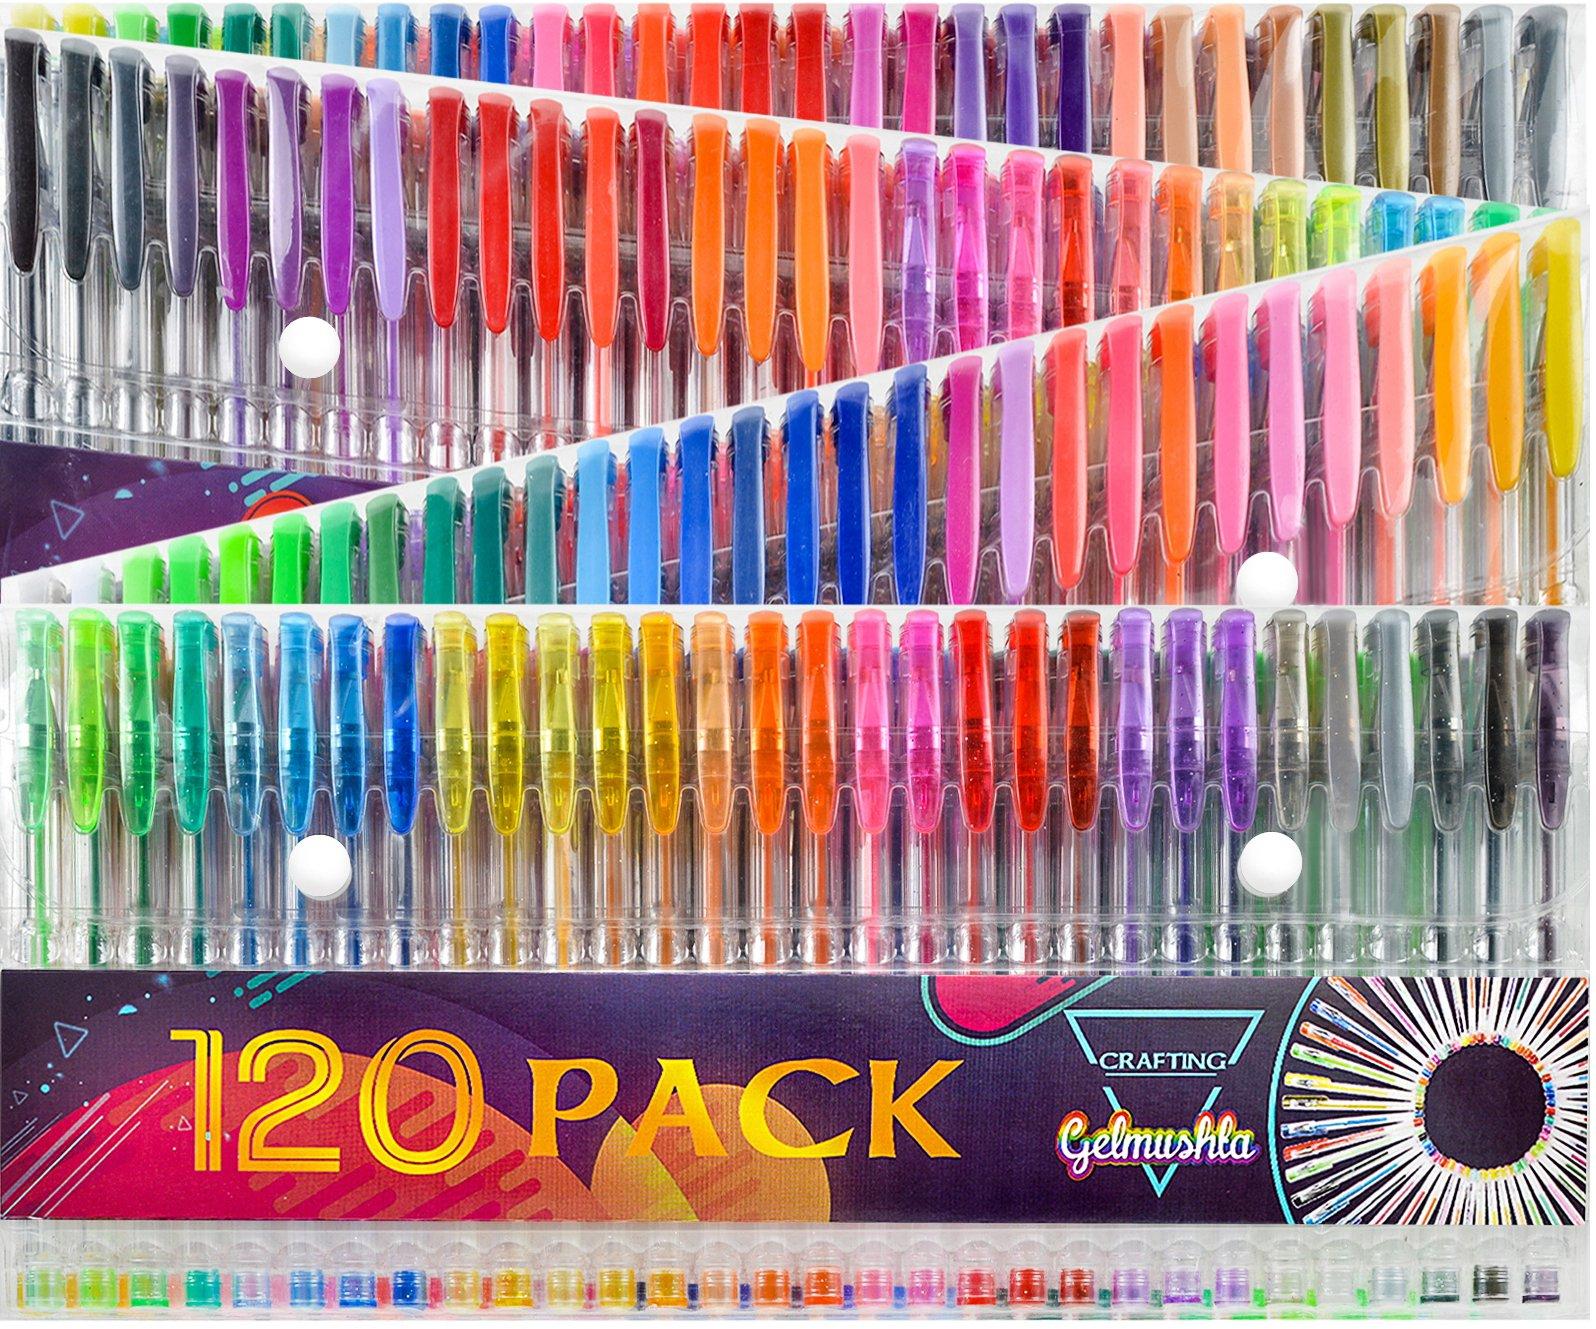 Gelmushta 240 Gel Pens Set (120 Unique Color Gel Pens and 120 Ink Refills) for Adult Coloring Books